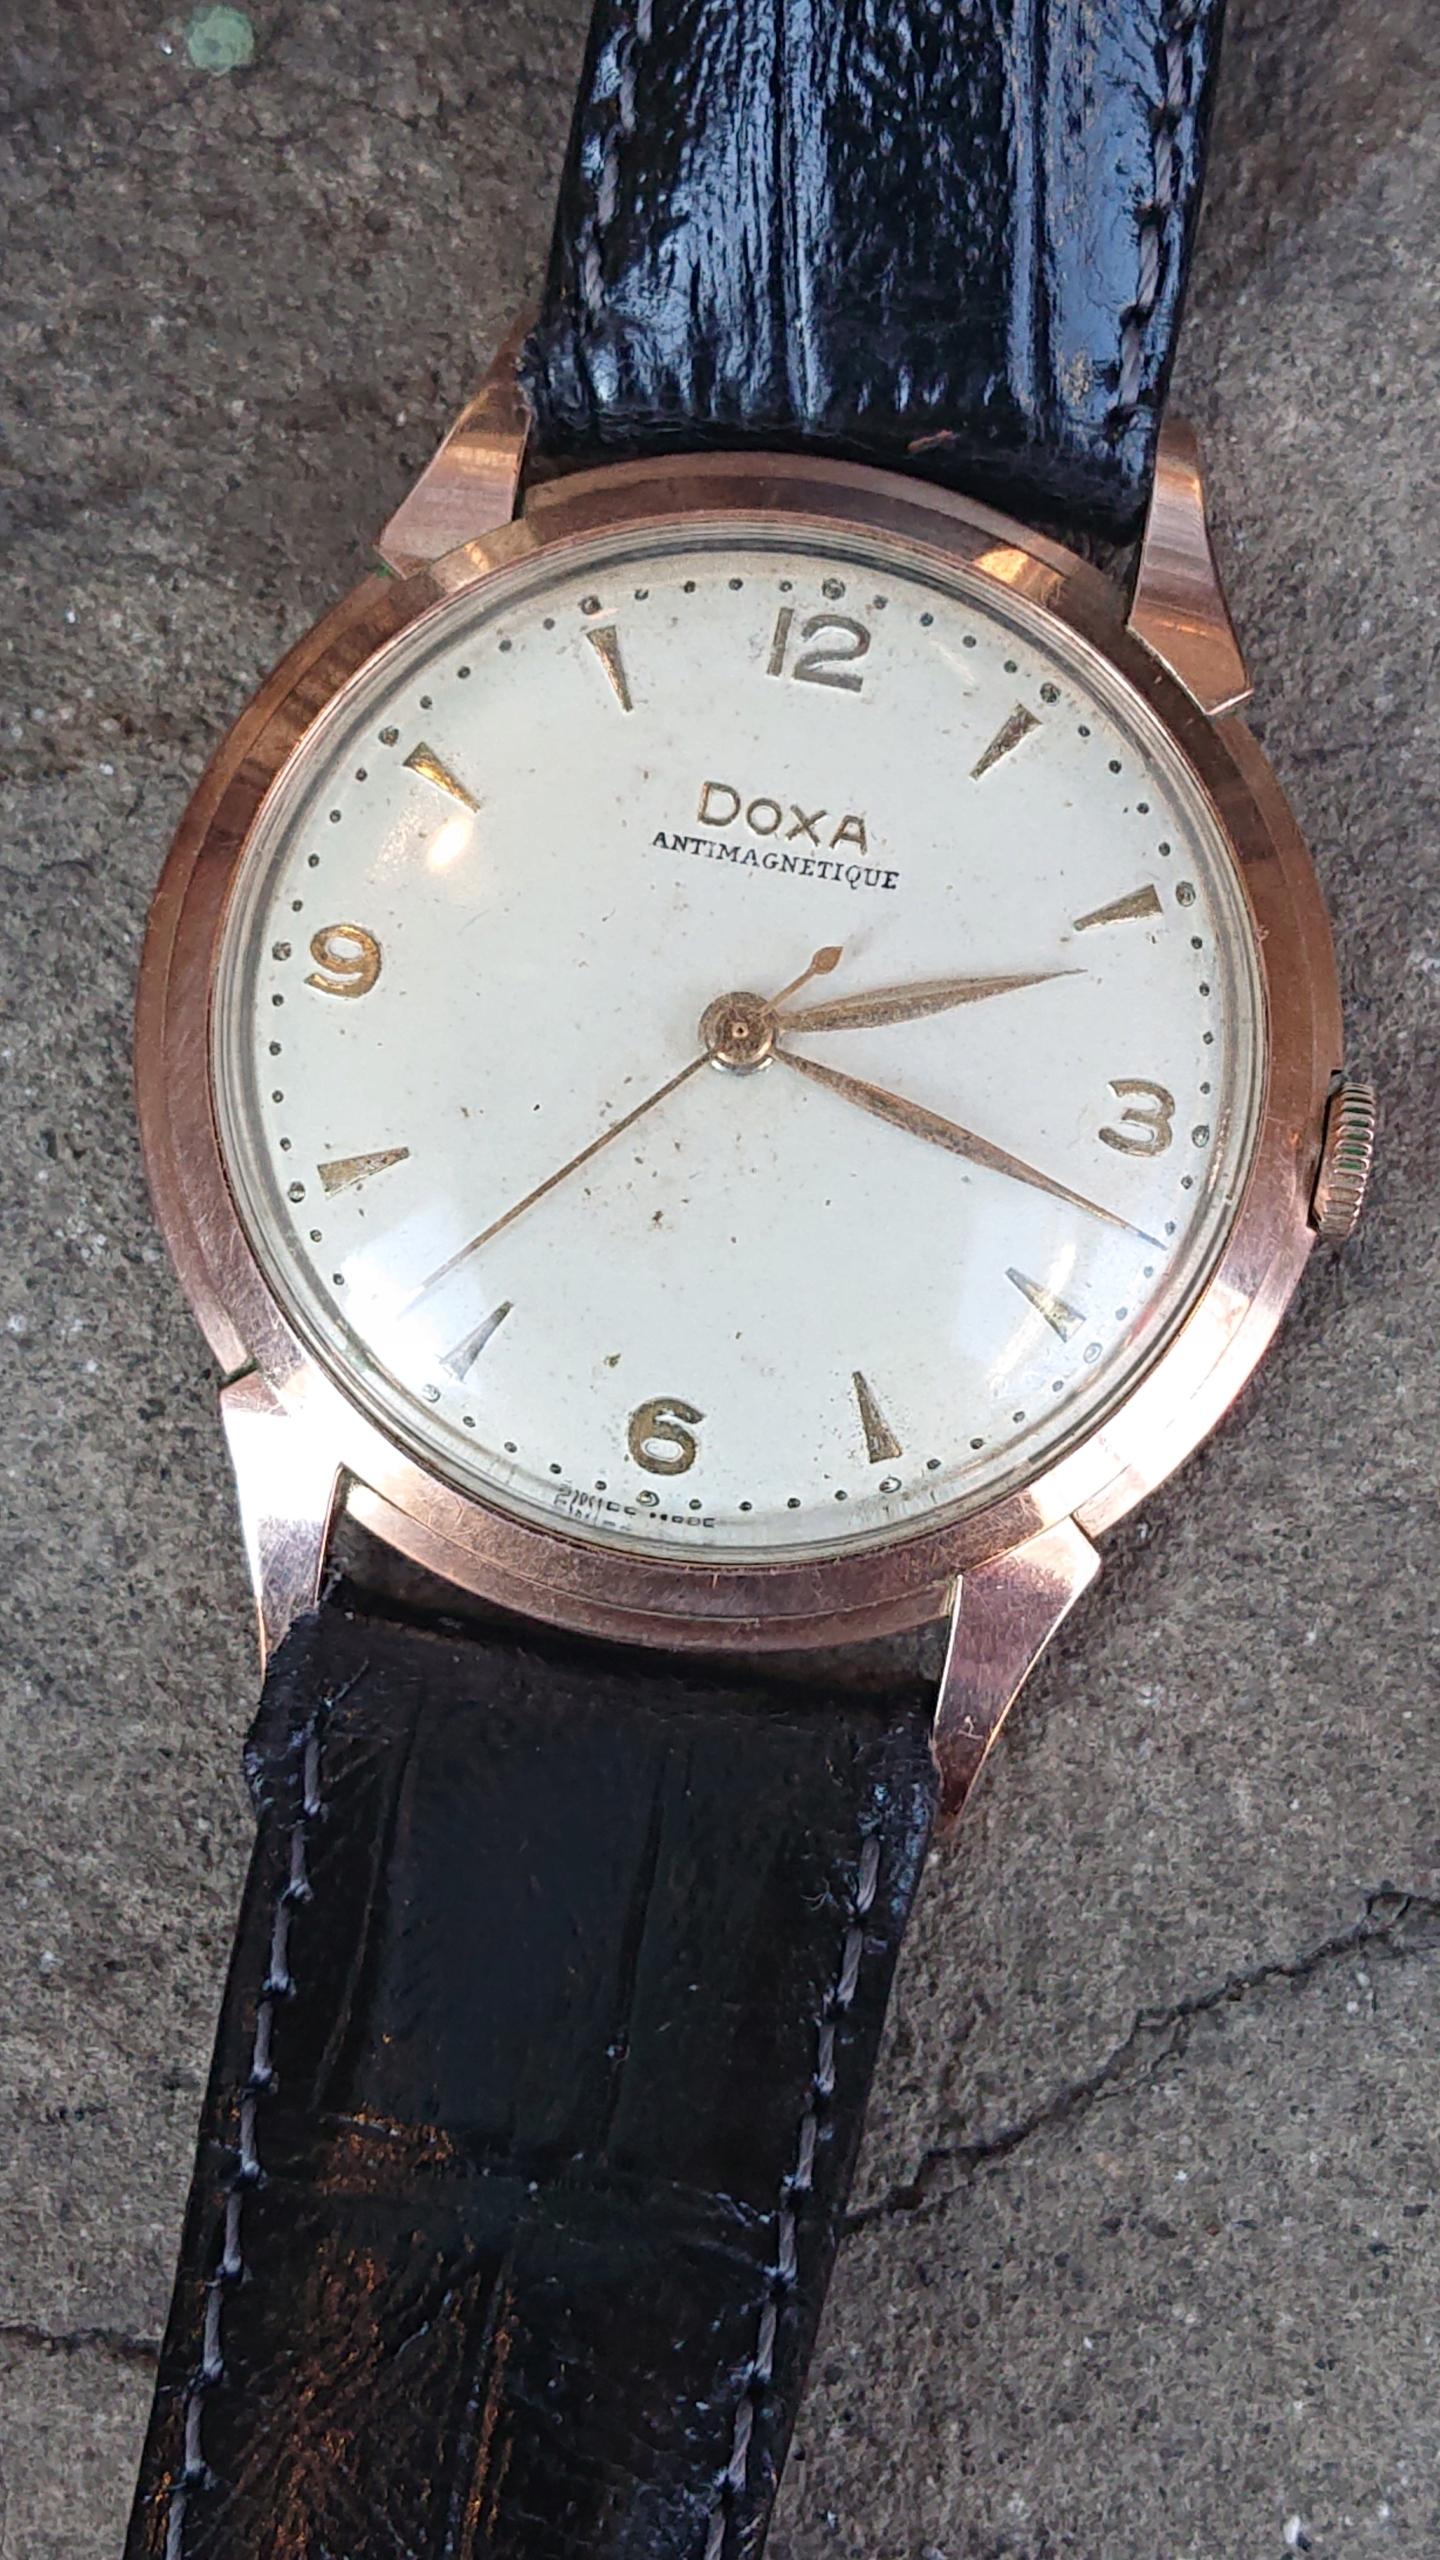 Zegarek Doxa , klaiber 1147, złota 14K